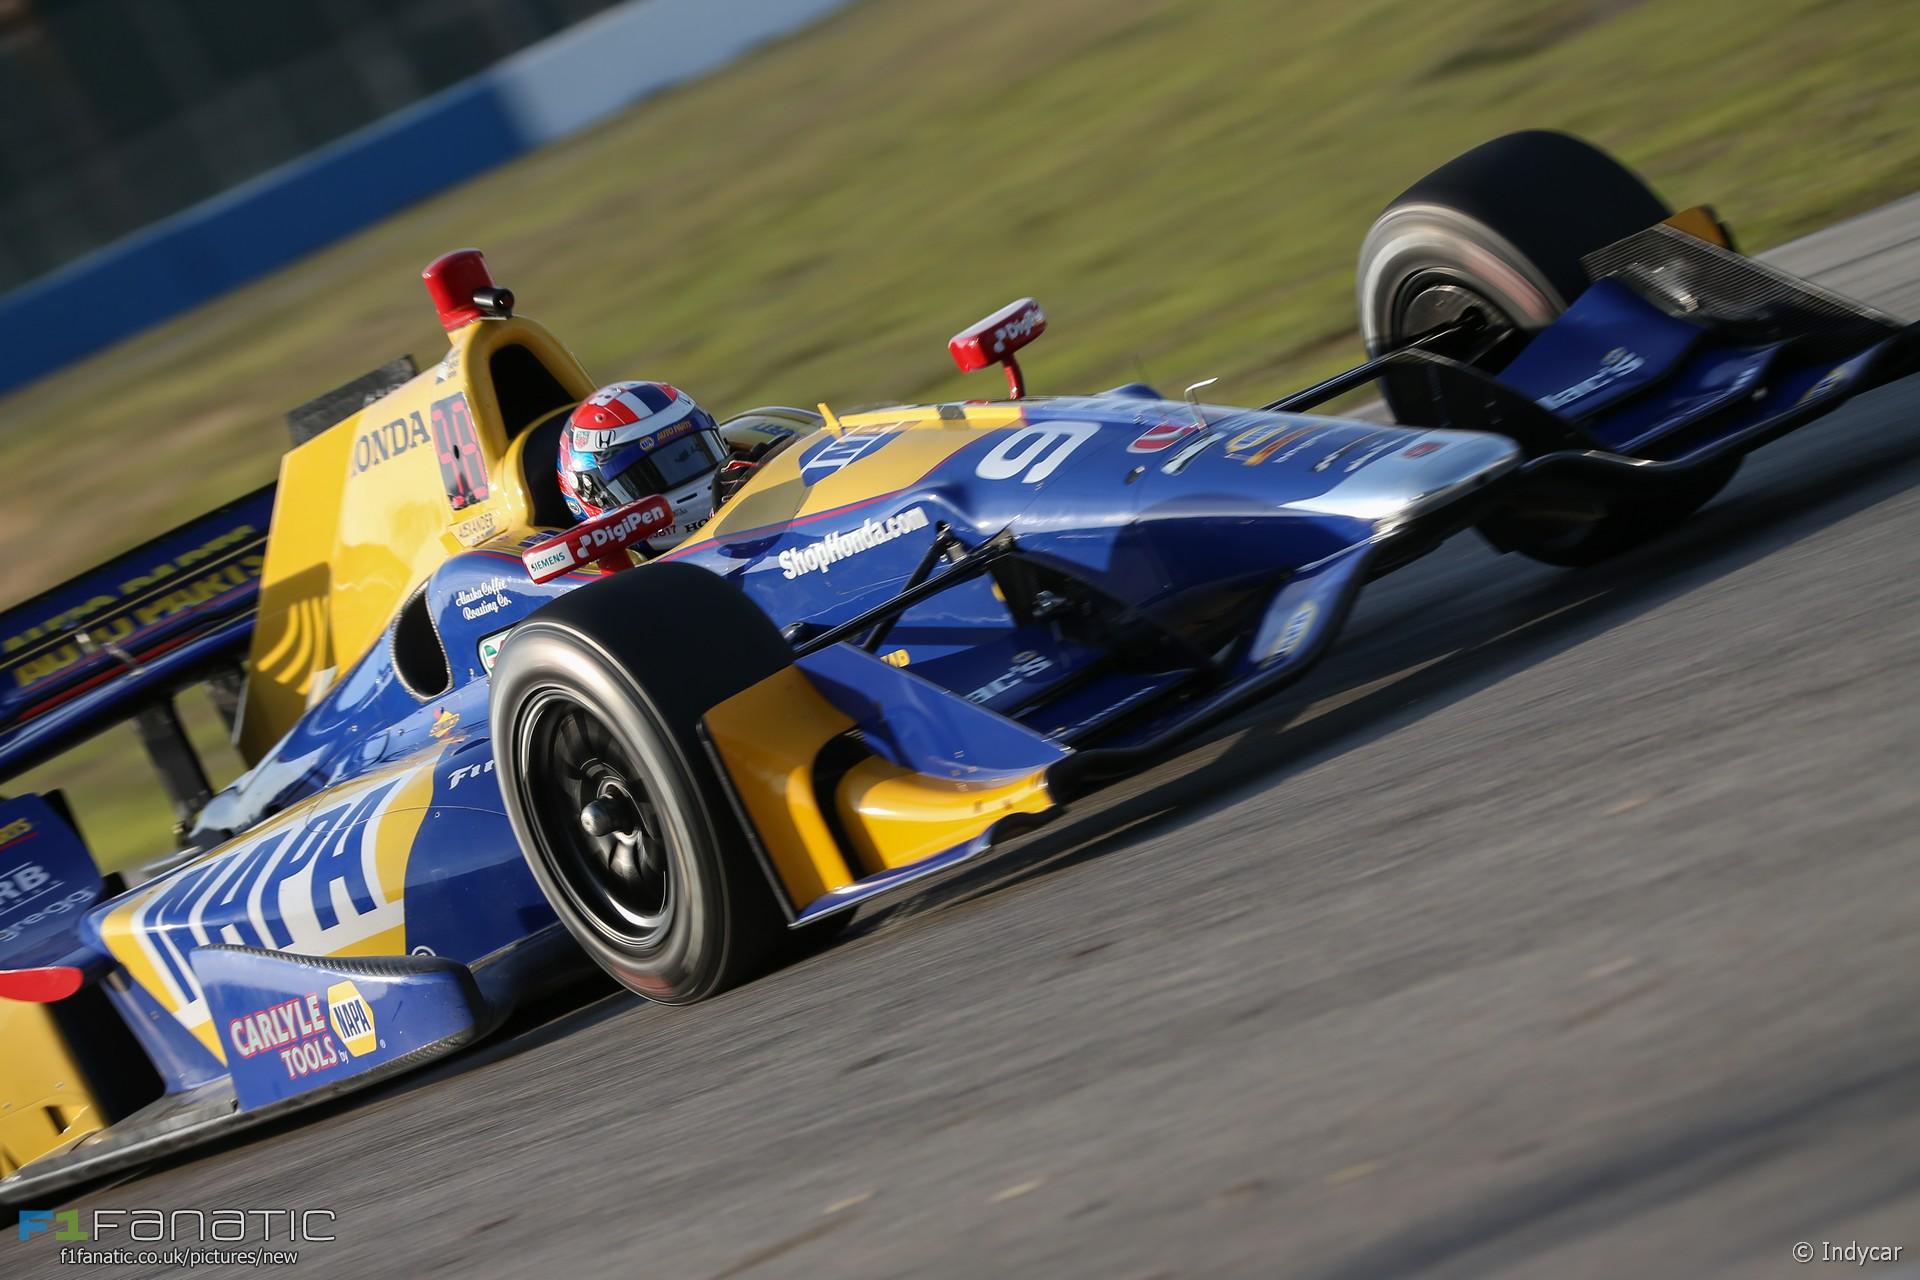 Alexander Rossi, Andretti-Herta, IndyCar, 2017